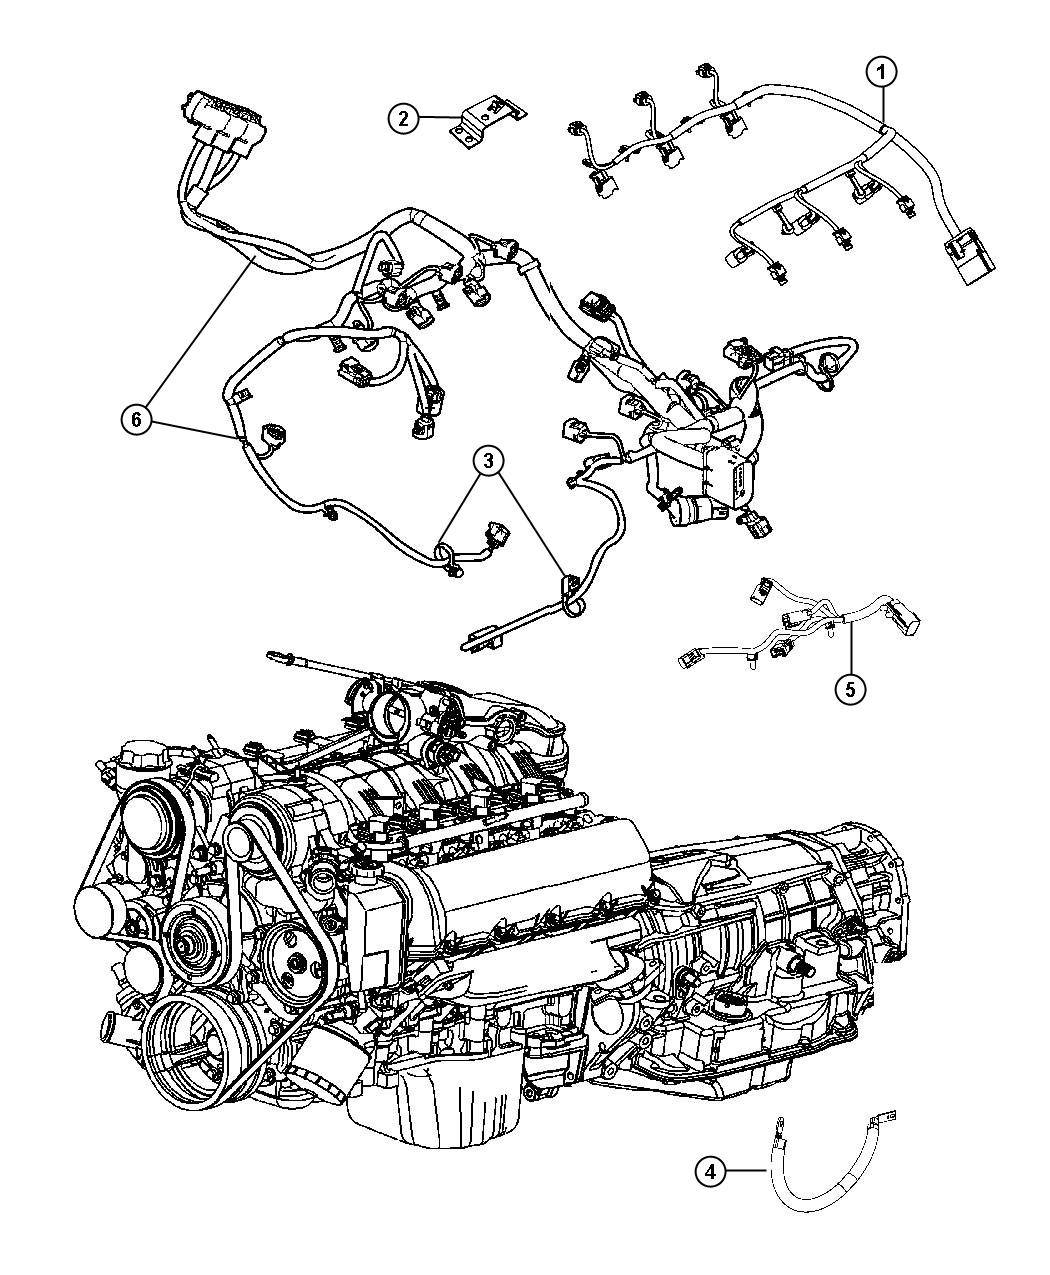 2013 Jeep Grand Cherokee Wiring  Engine  Gas  Powertrain